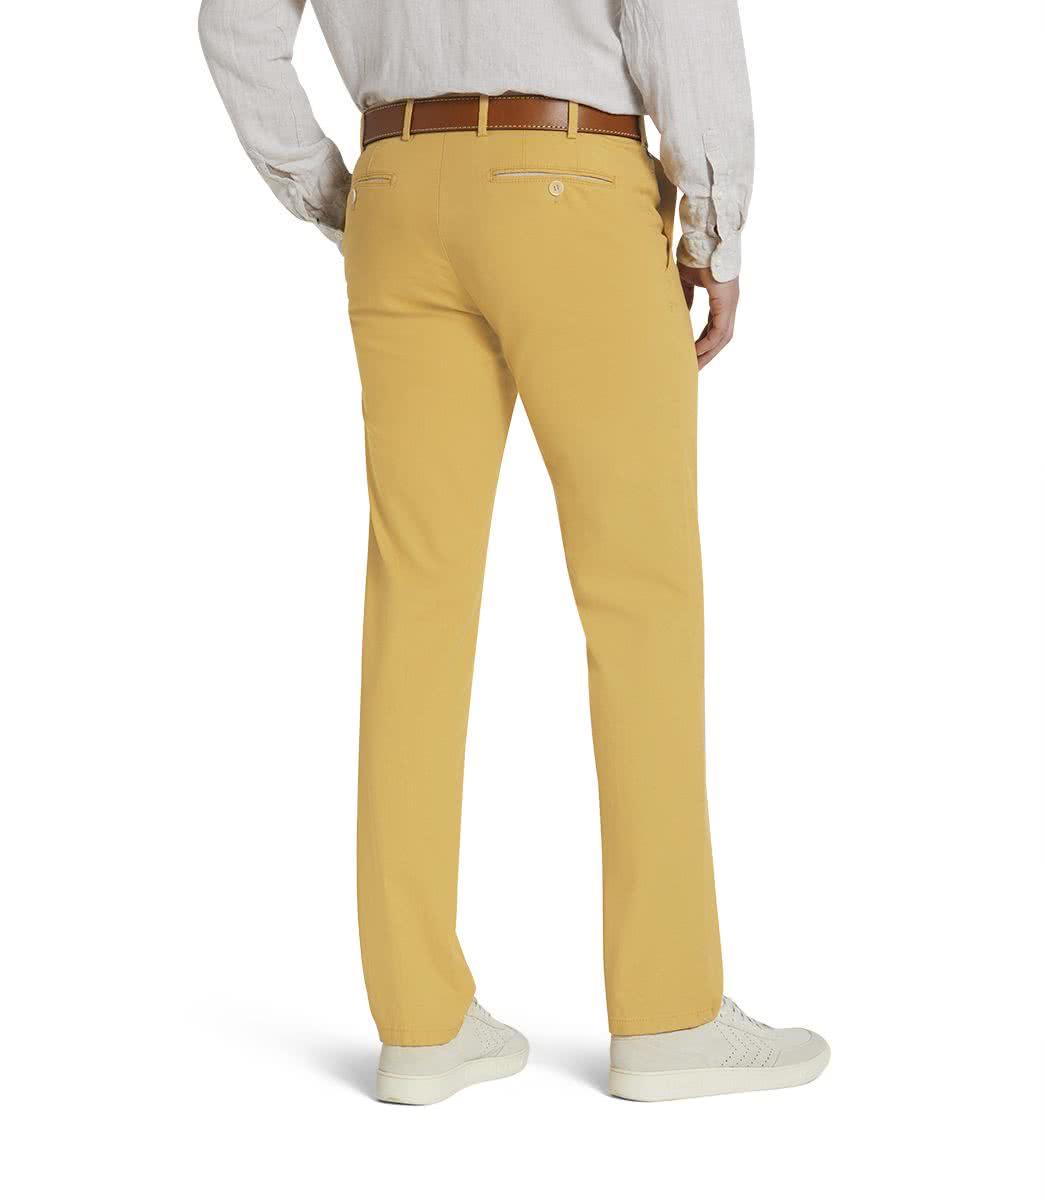 meyer fs21 bonn 1 5039 43 hinten 16870 - - Con Murphys Menswear